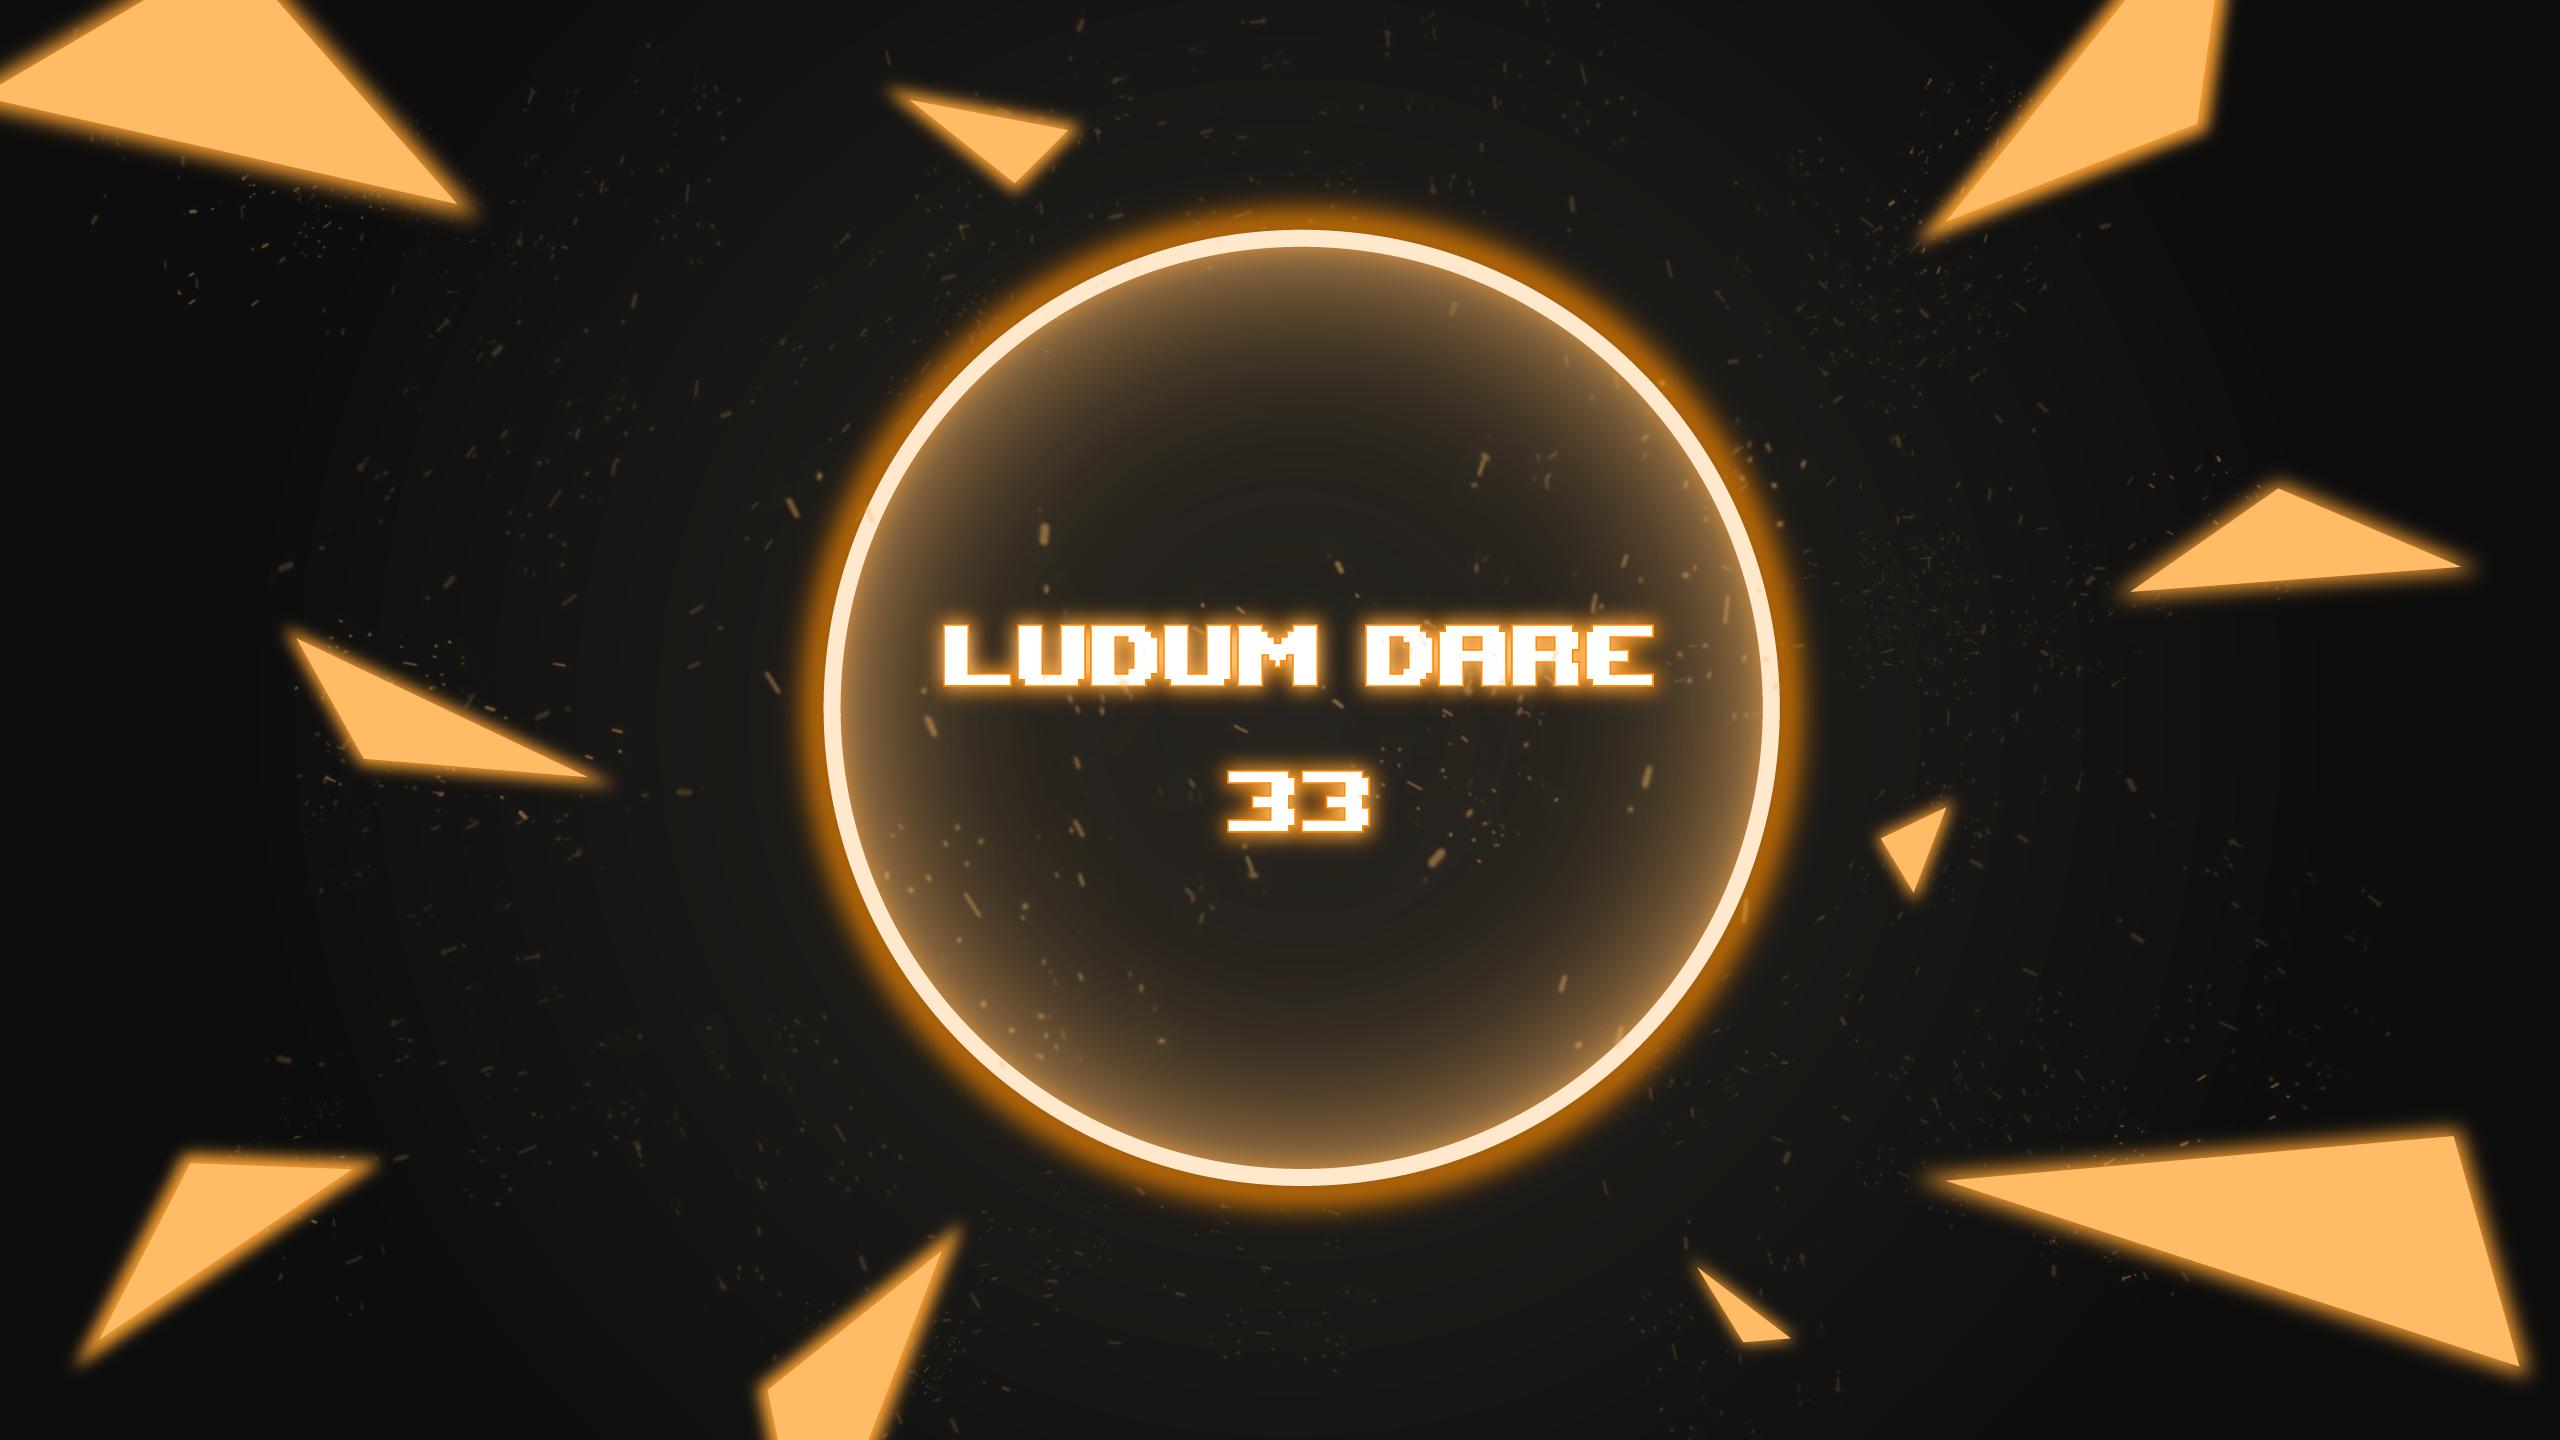 Ludum Dare 33 Wallpaper Ludum Dare 2560x1440